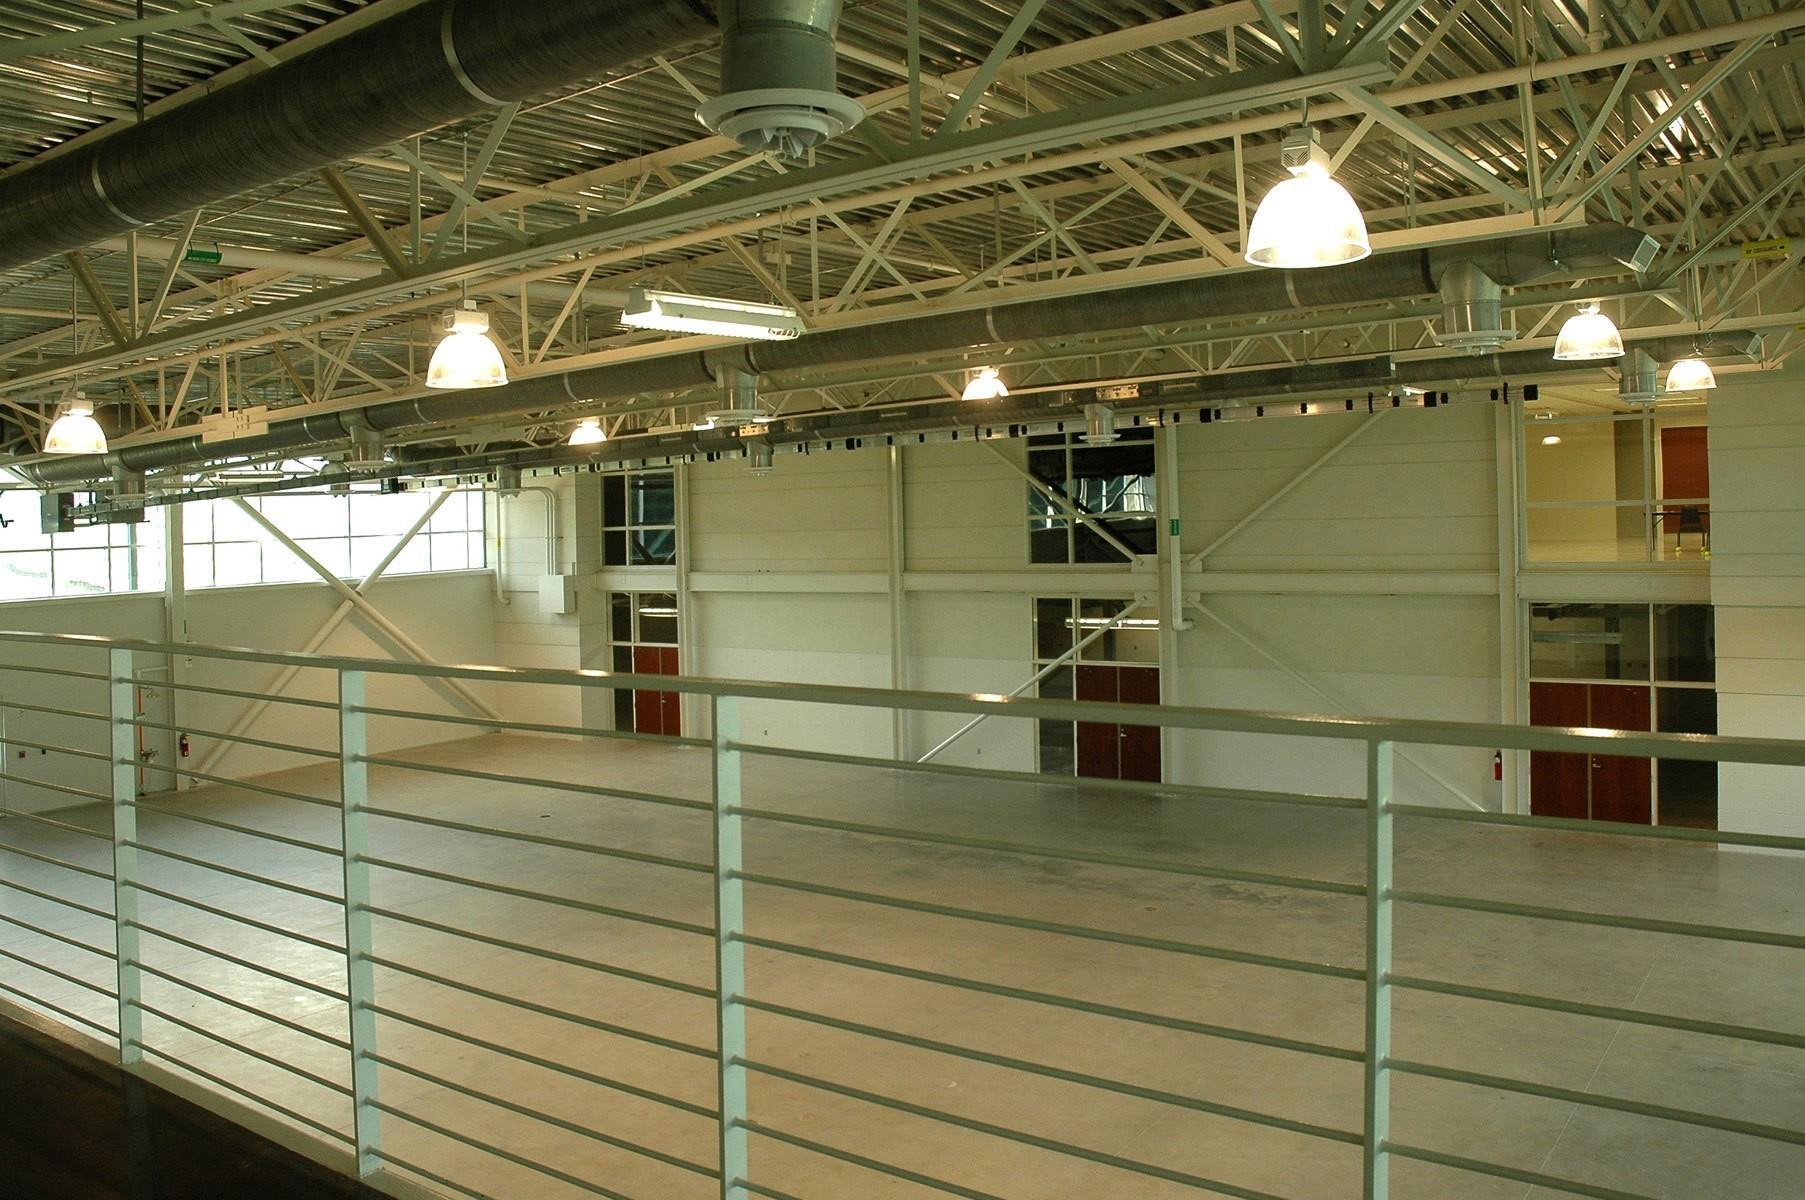 kia-training-center-interior